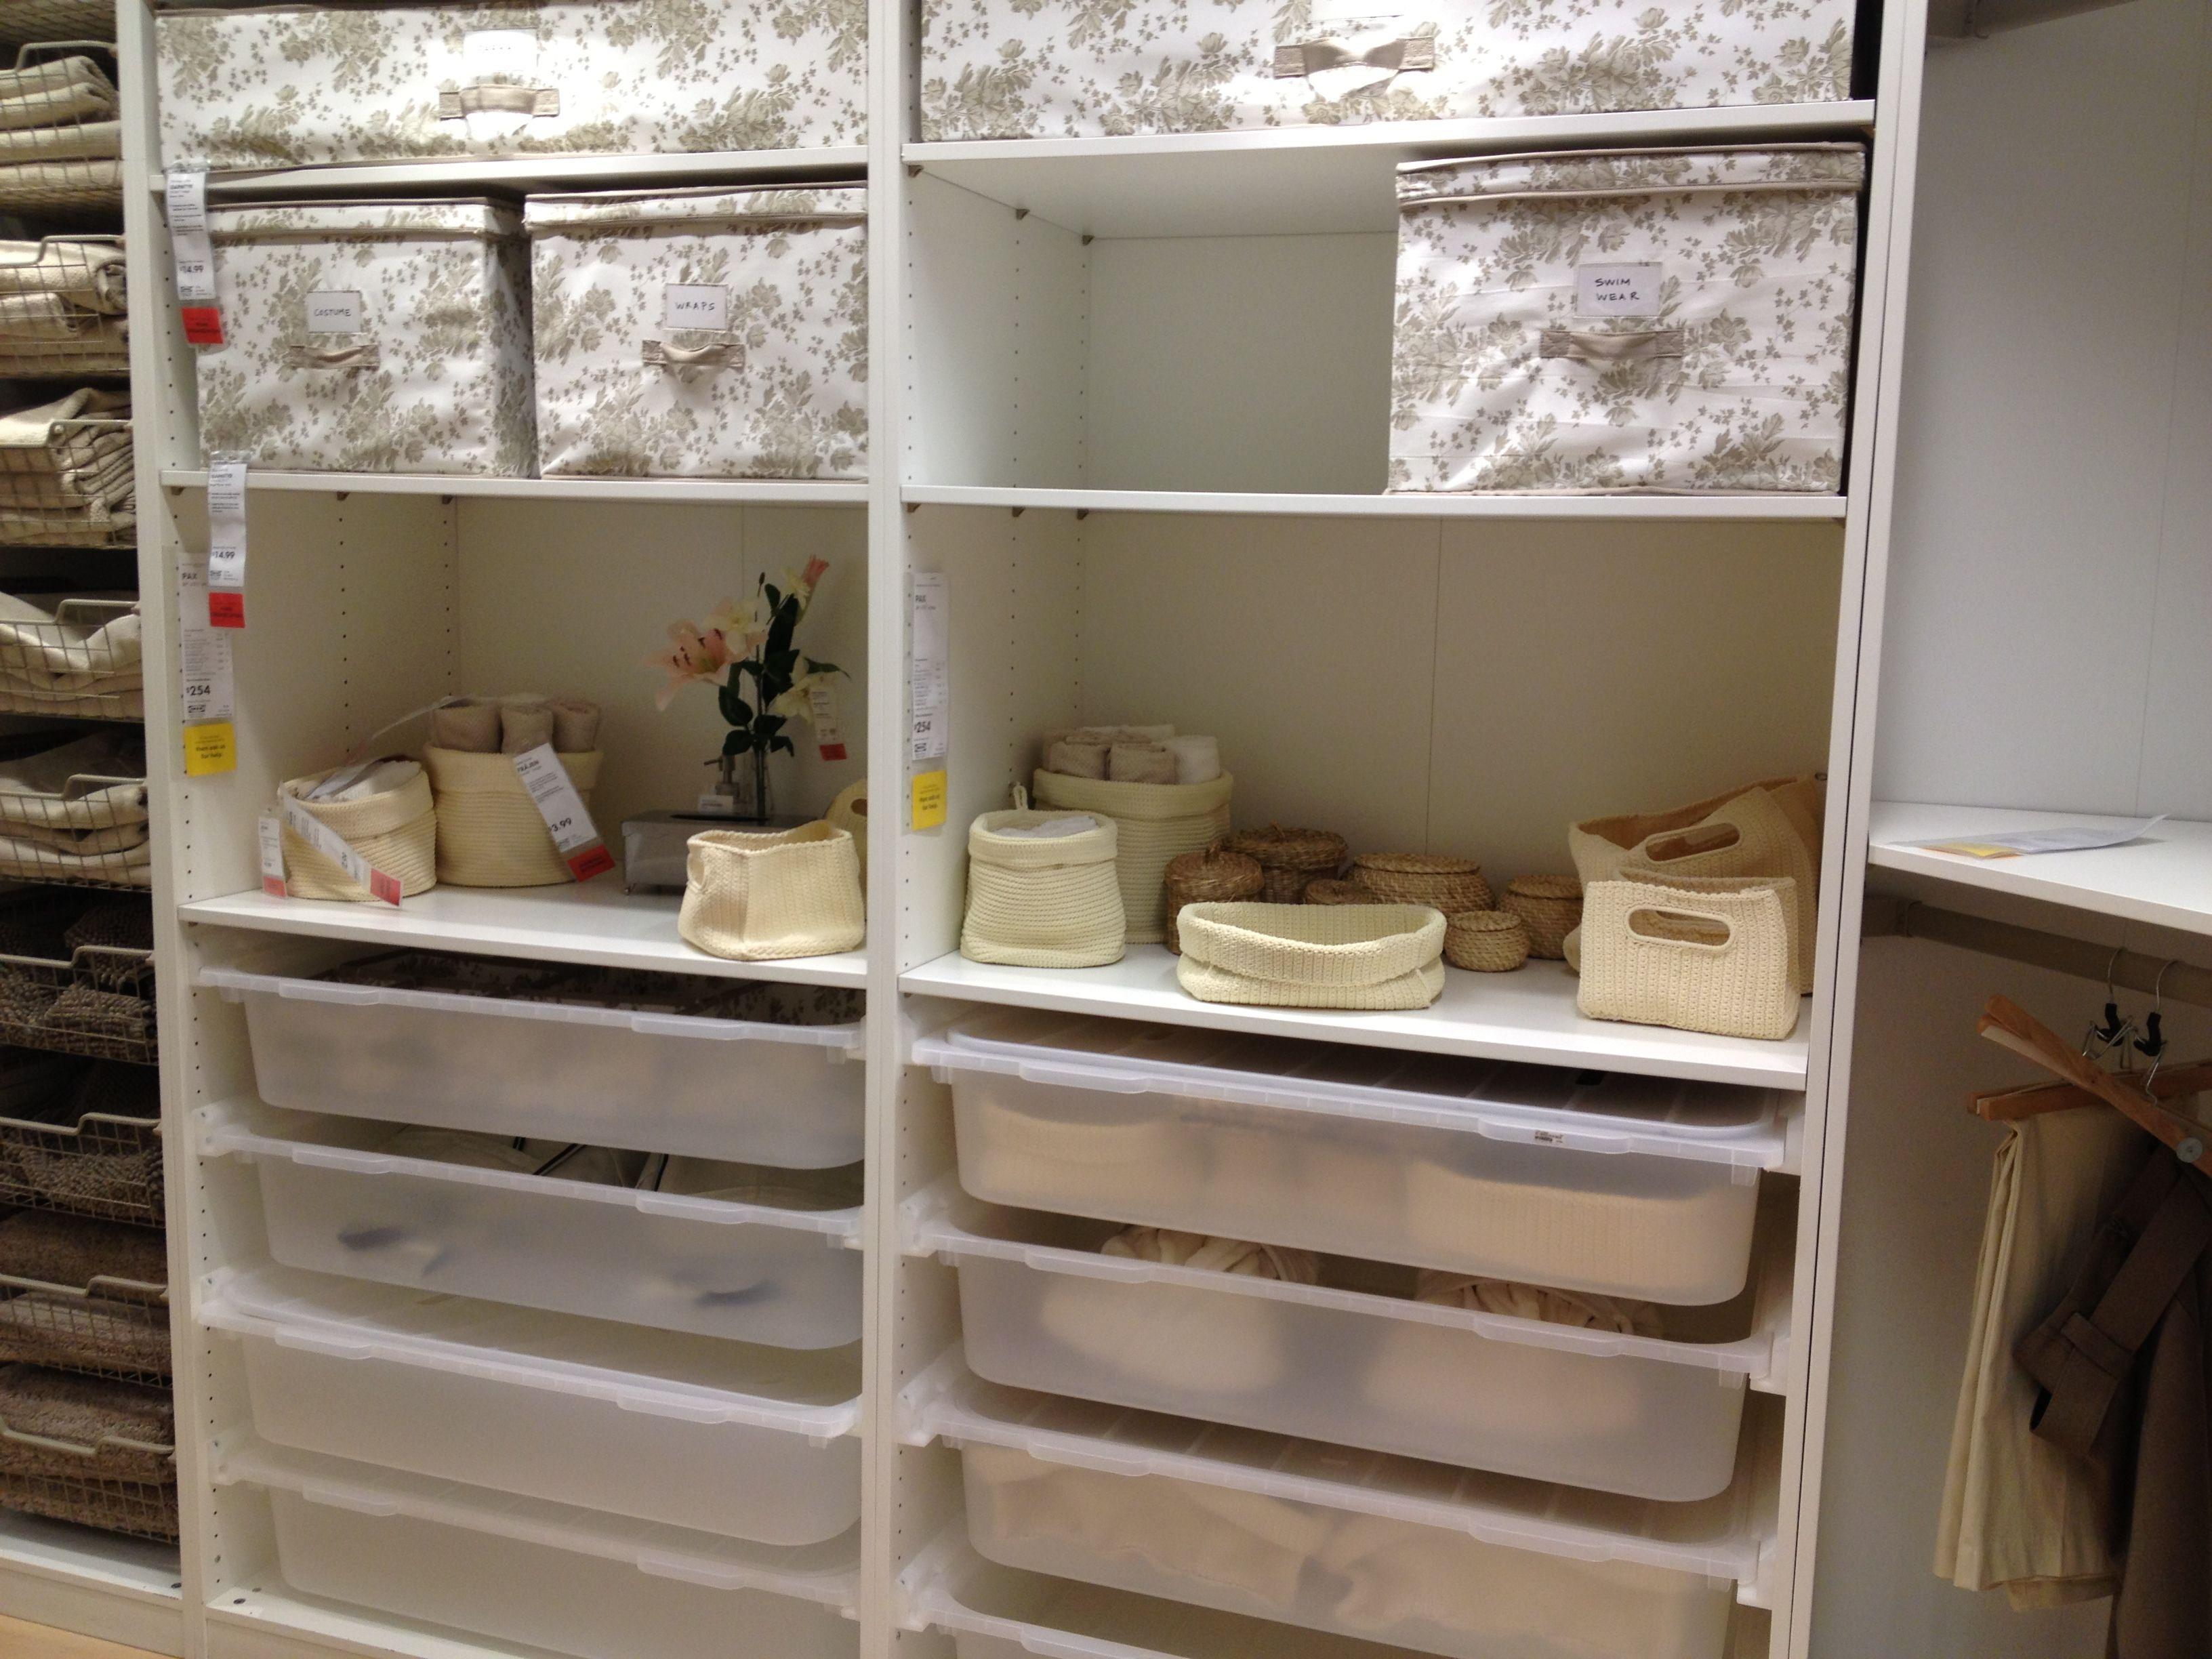 Closet organization from ikea home organization pinterest for Ikea closet storage